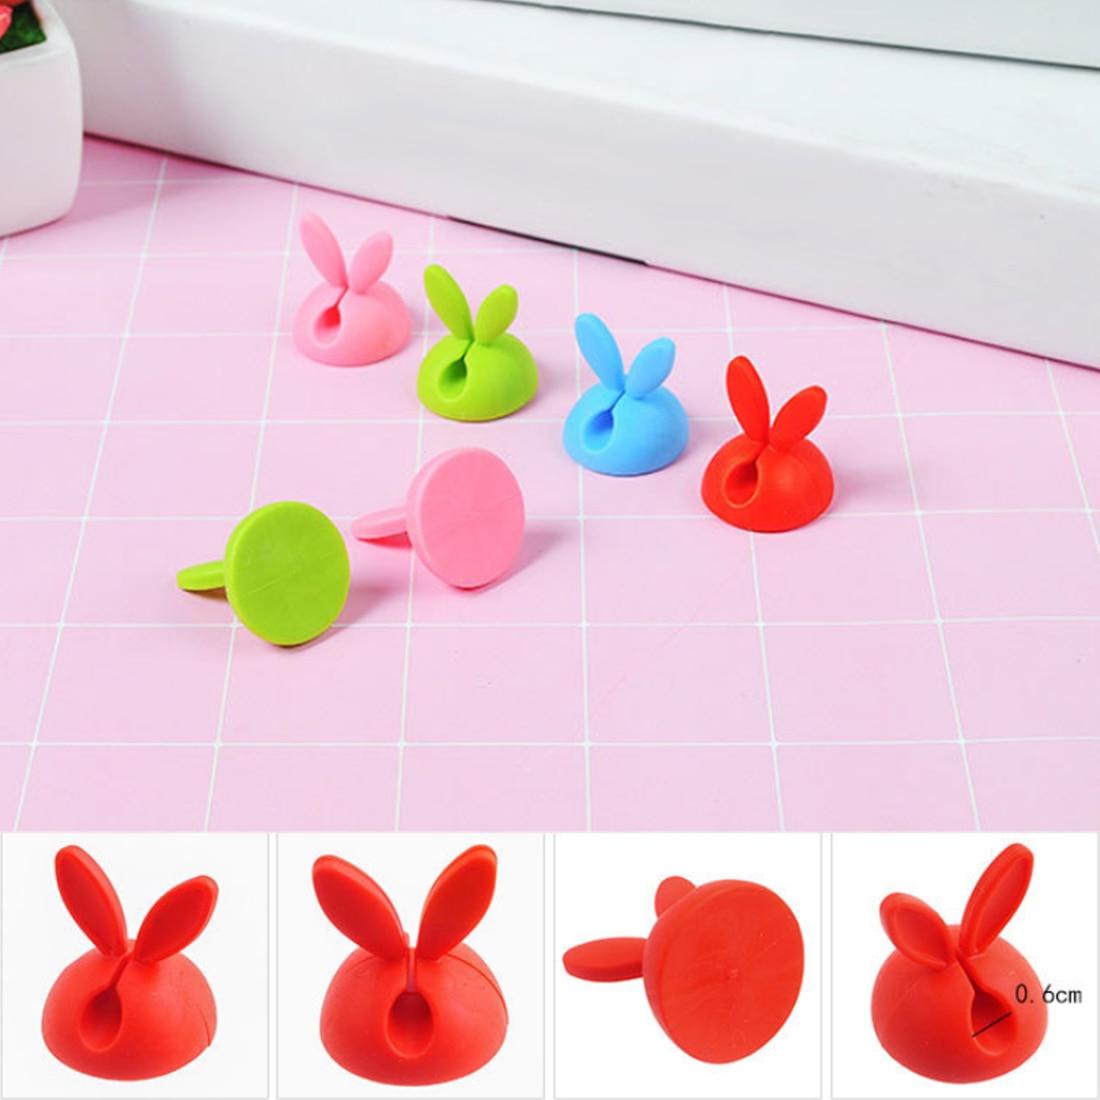 Cable-Organizer Headphone Rabbit-Ear Bobbin Wires-Holder Desktop-Winder 4pcs Computer